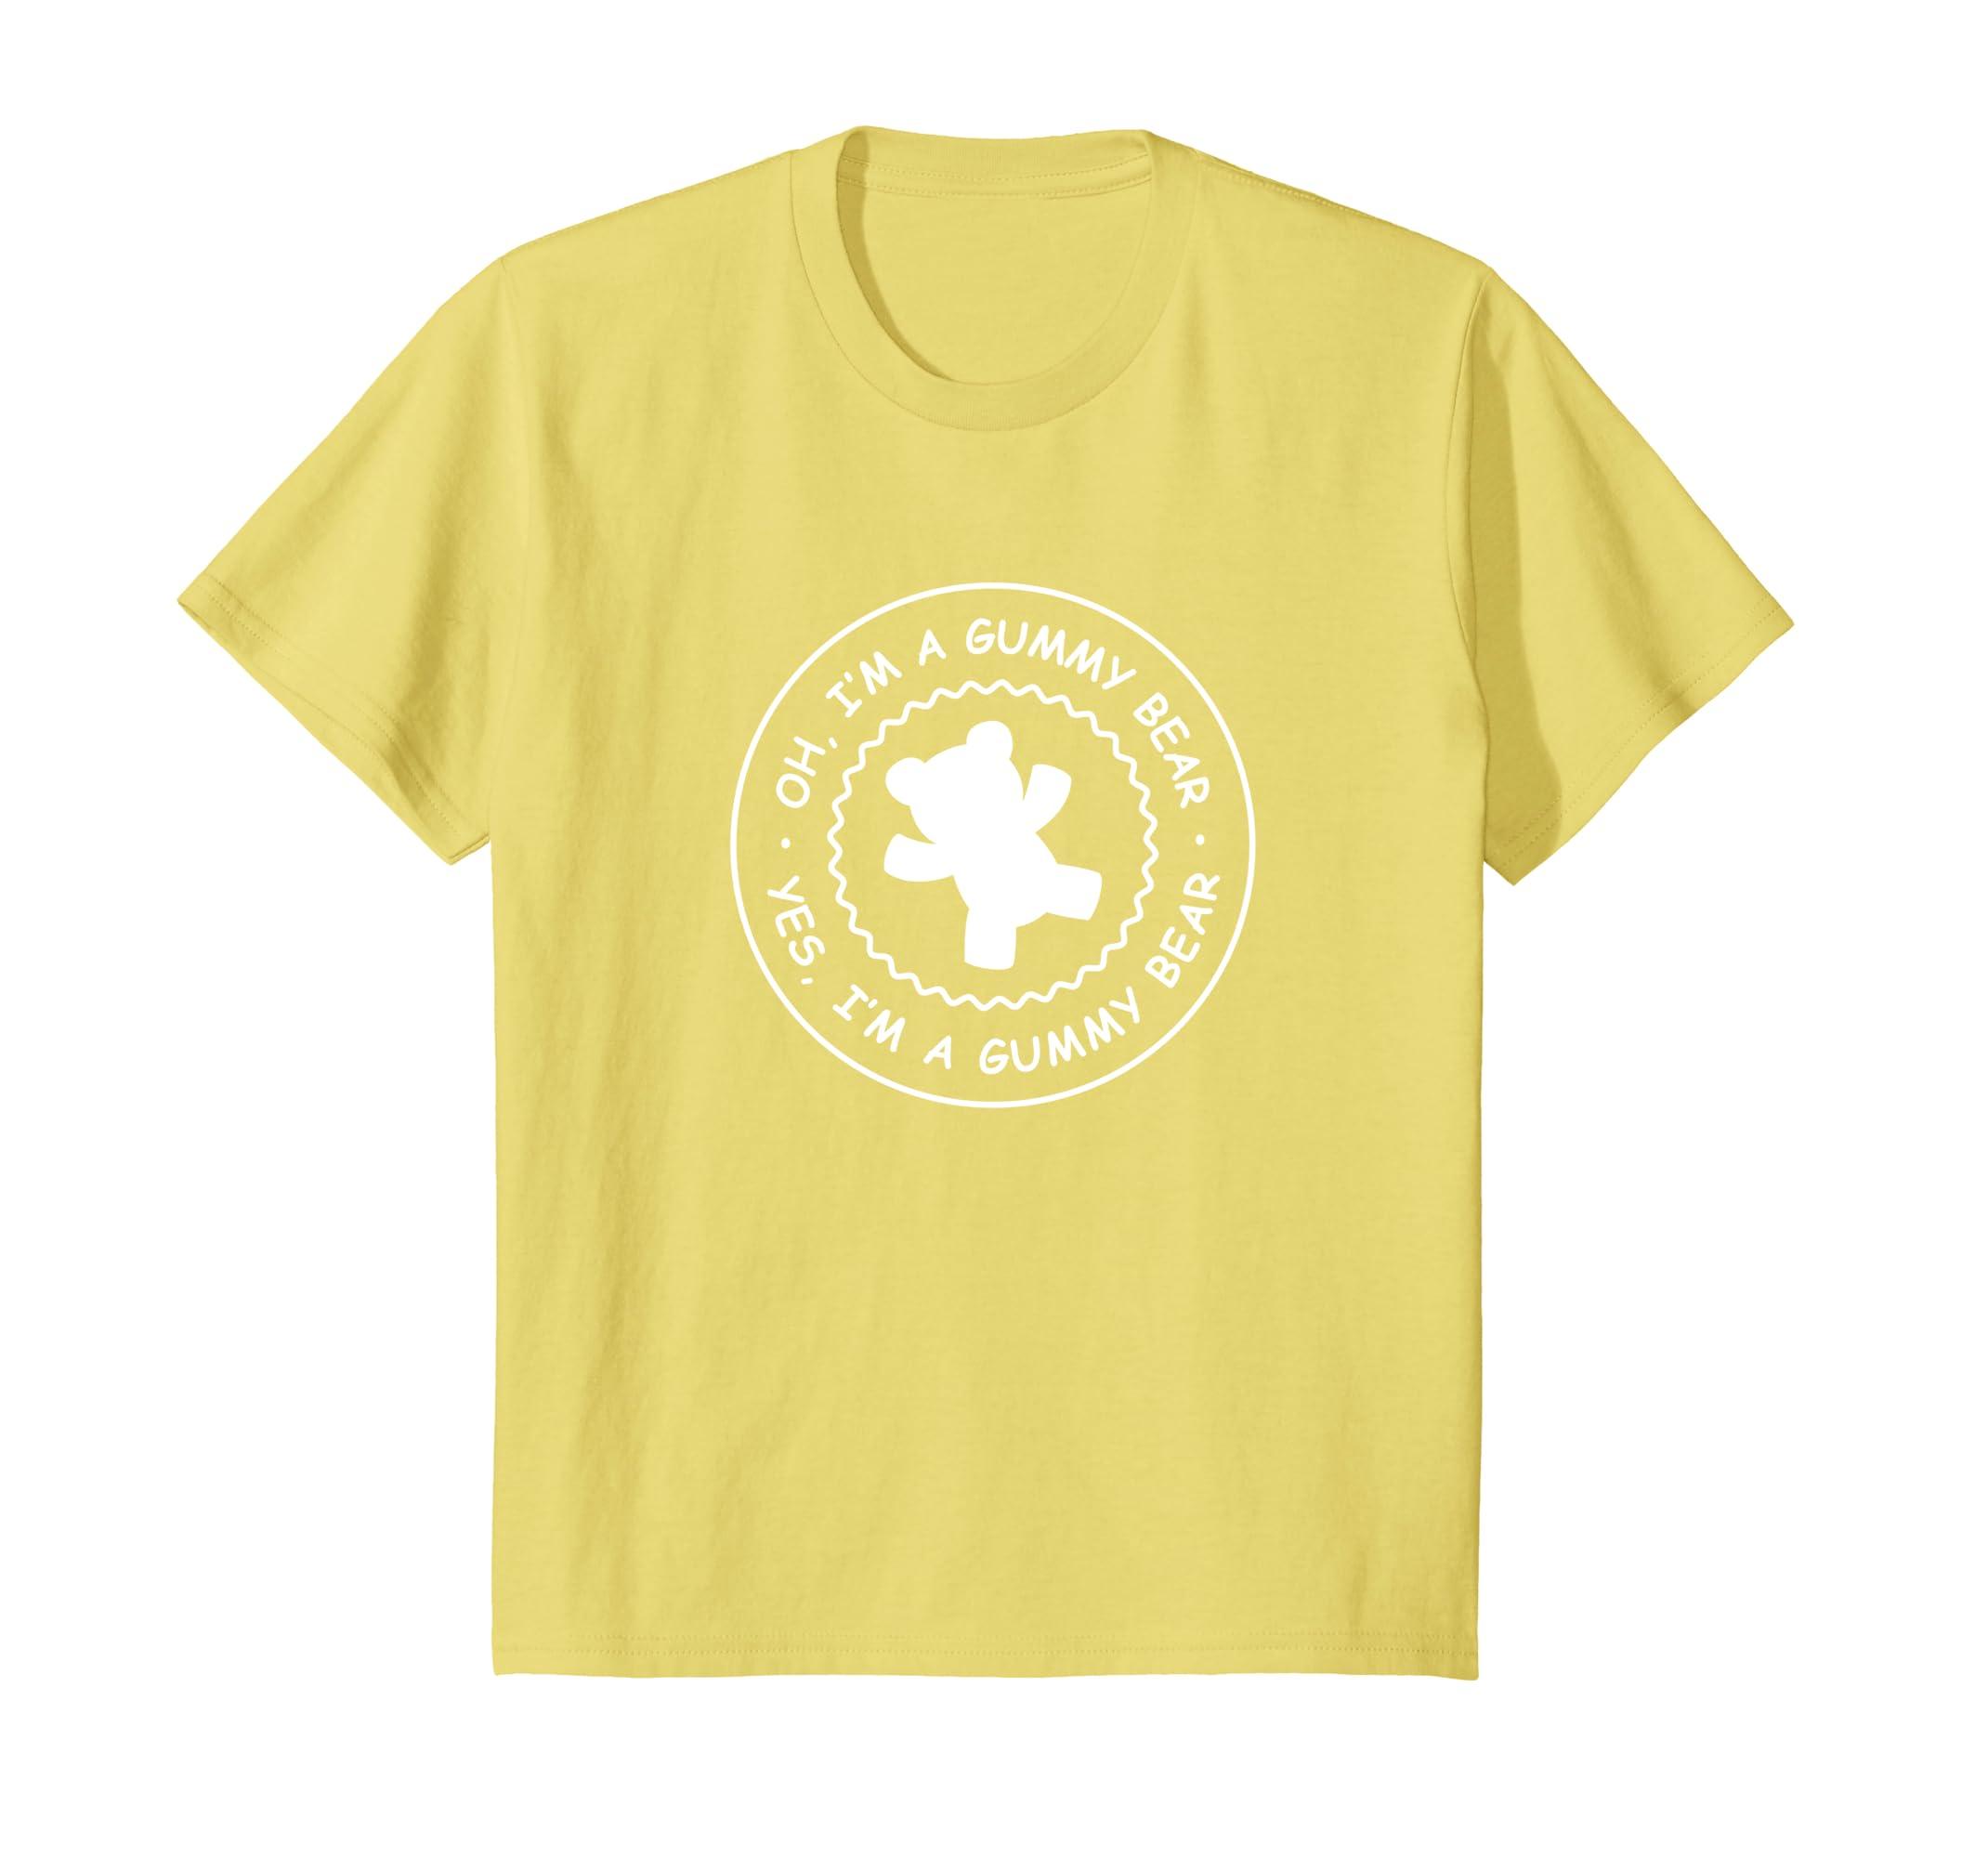 cf0b3bd18 Amazon.com: Kids Gummy Bear Shirt, I'm A Gummy Bear T-Shirt: Clothing